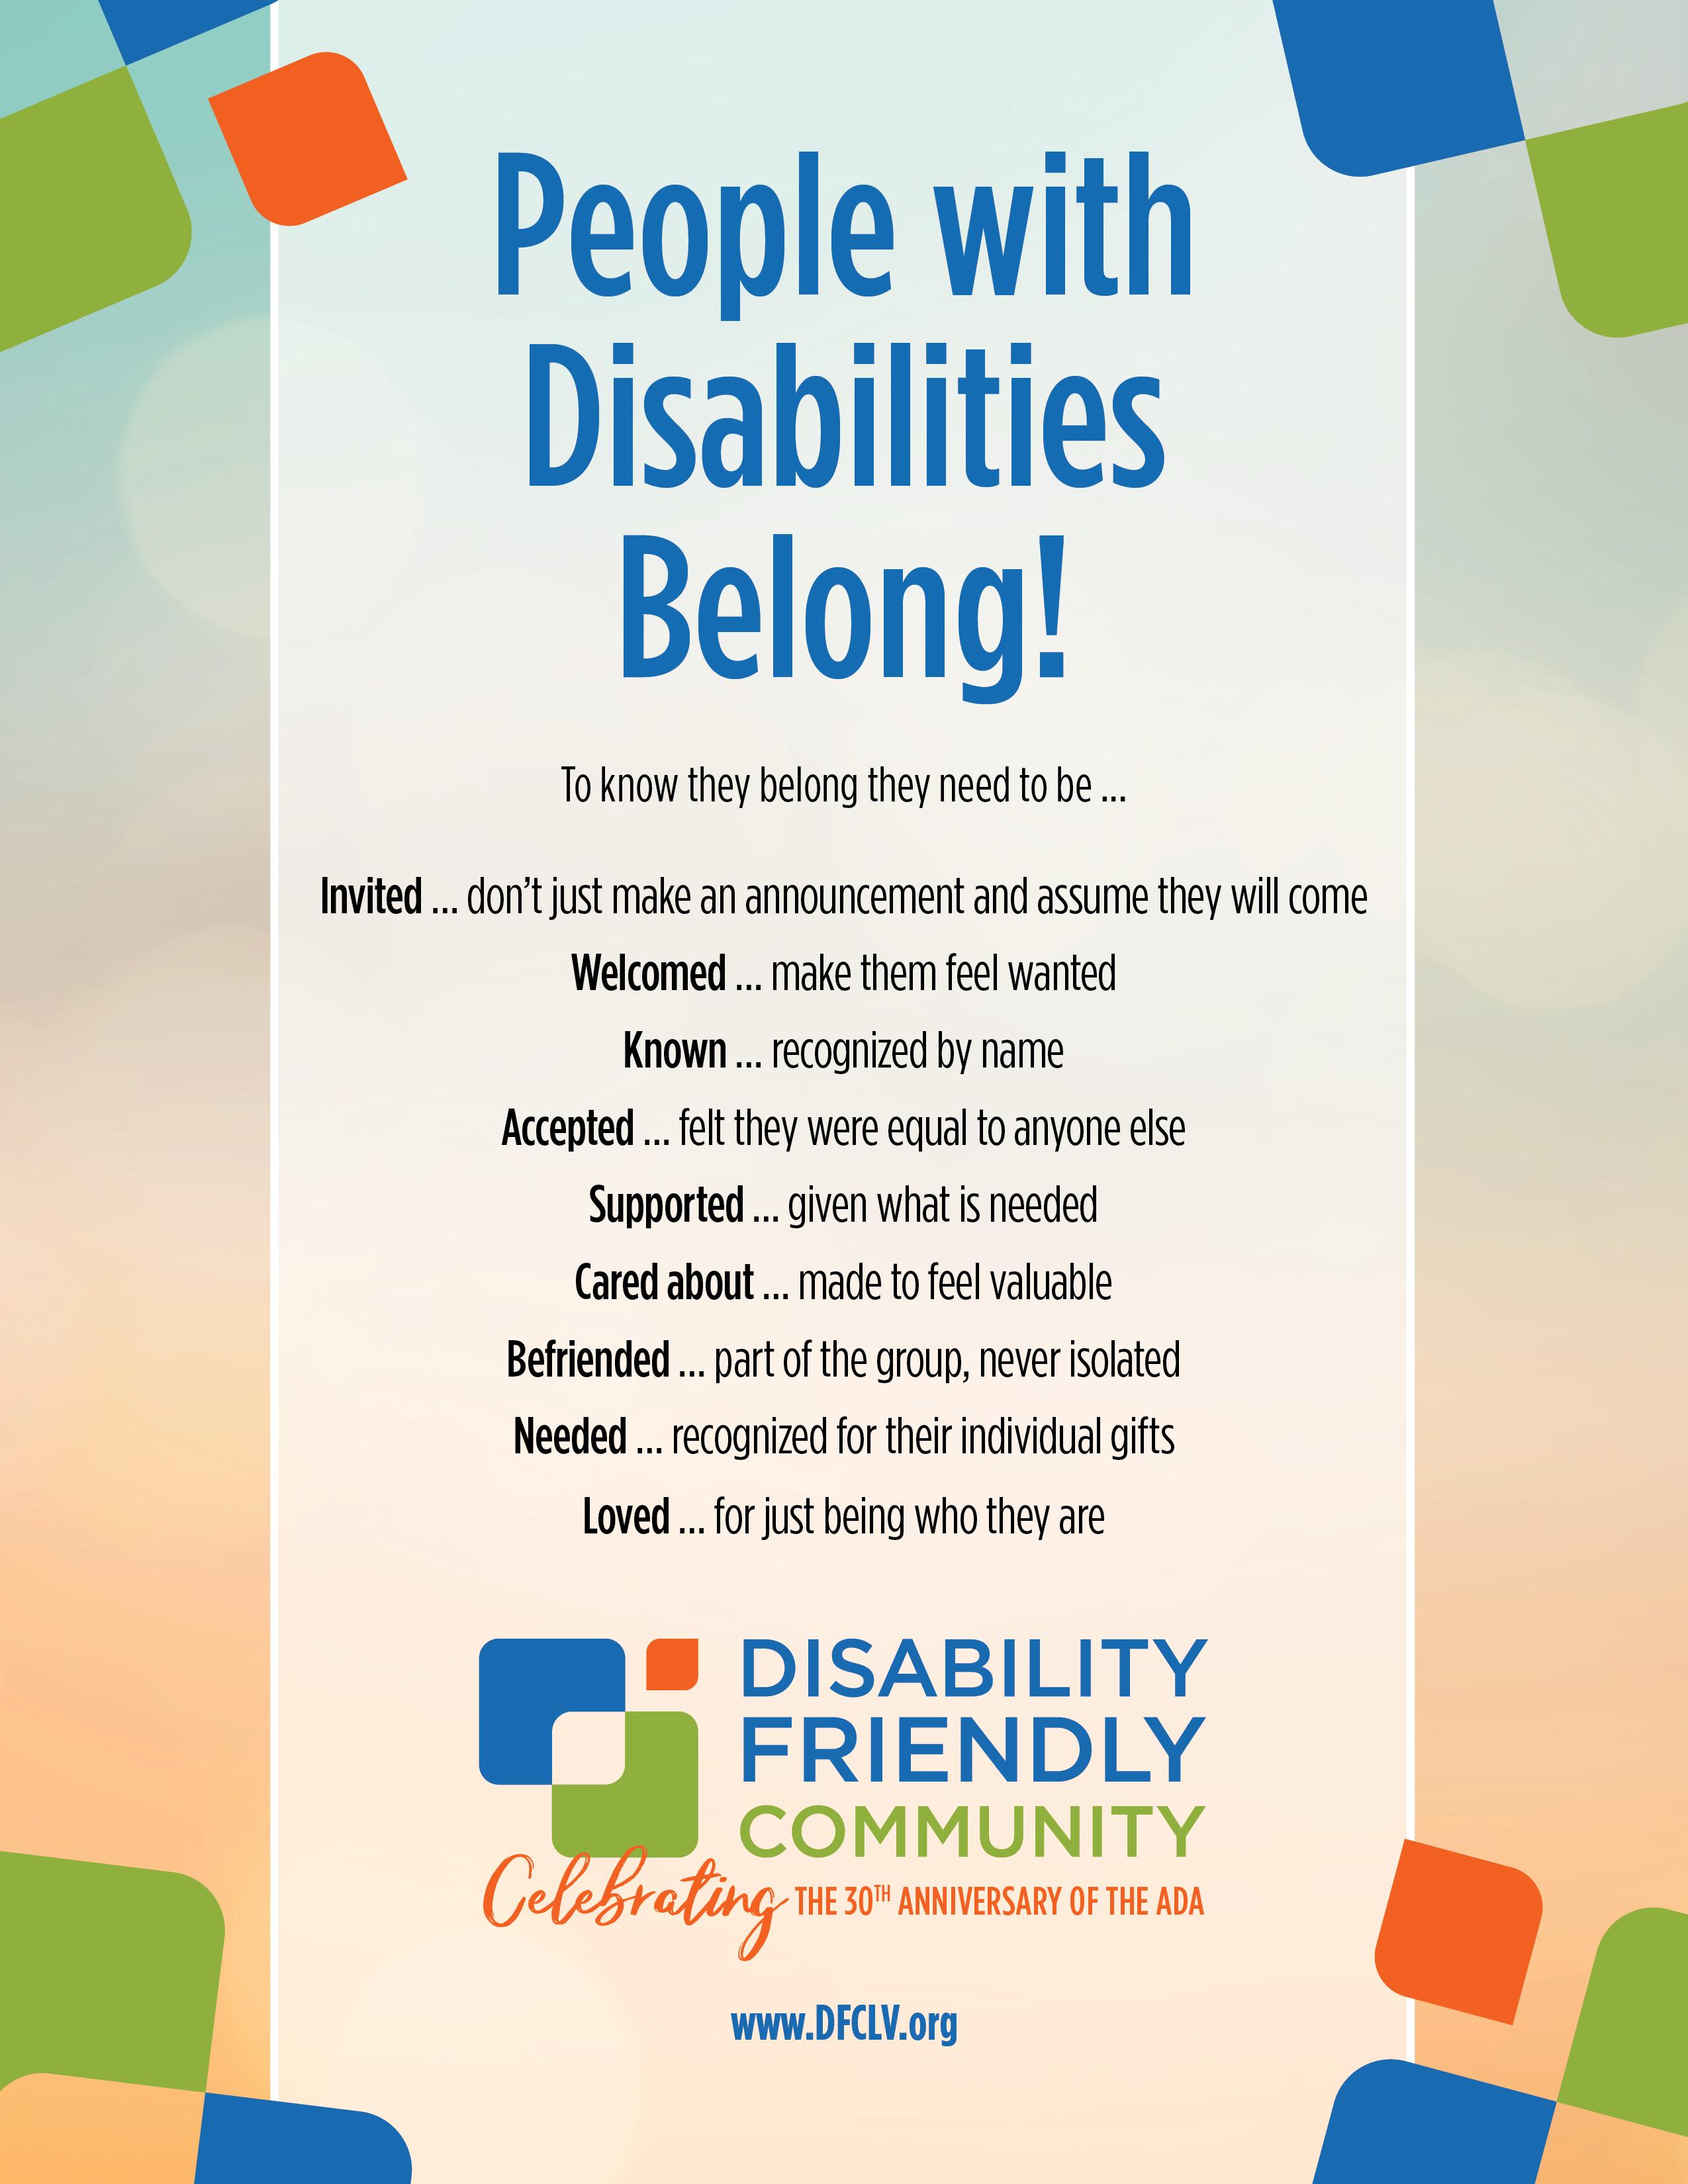 DFC Belong poster image